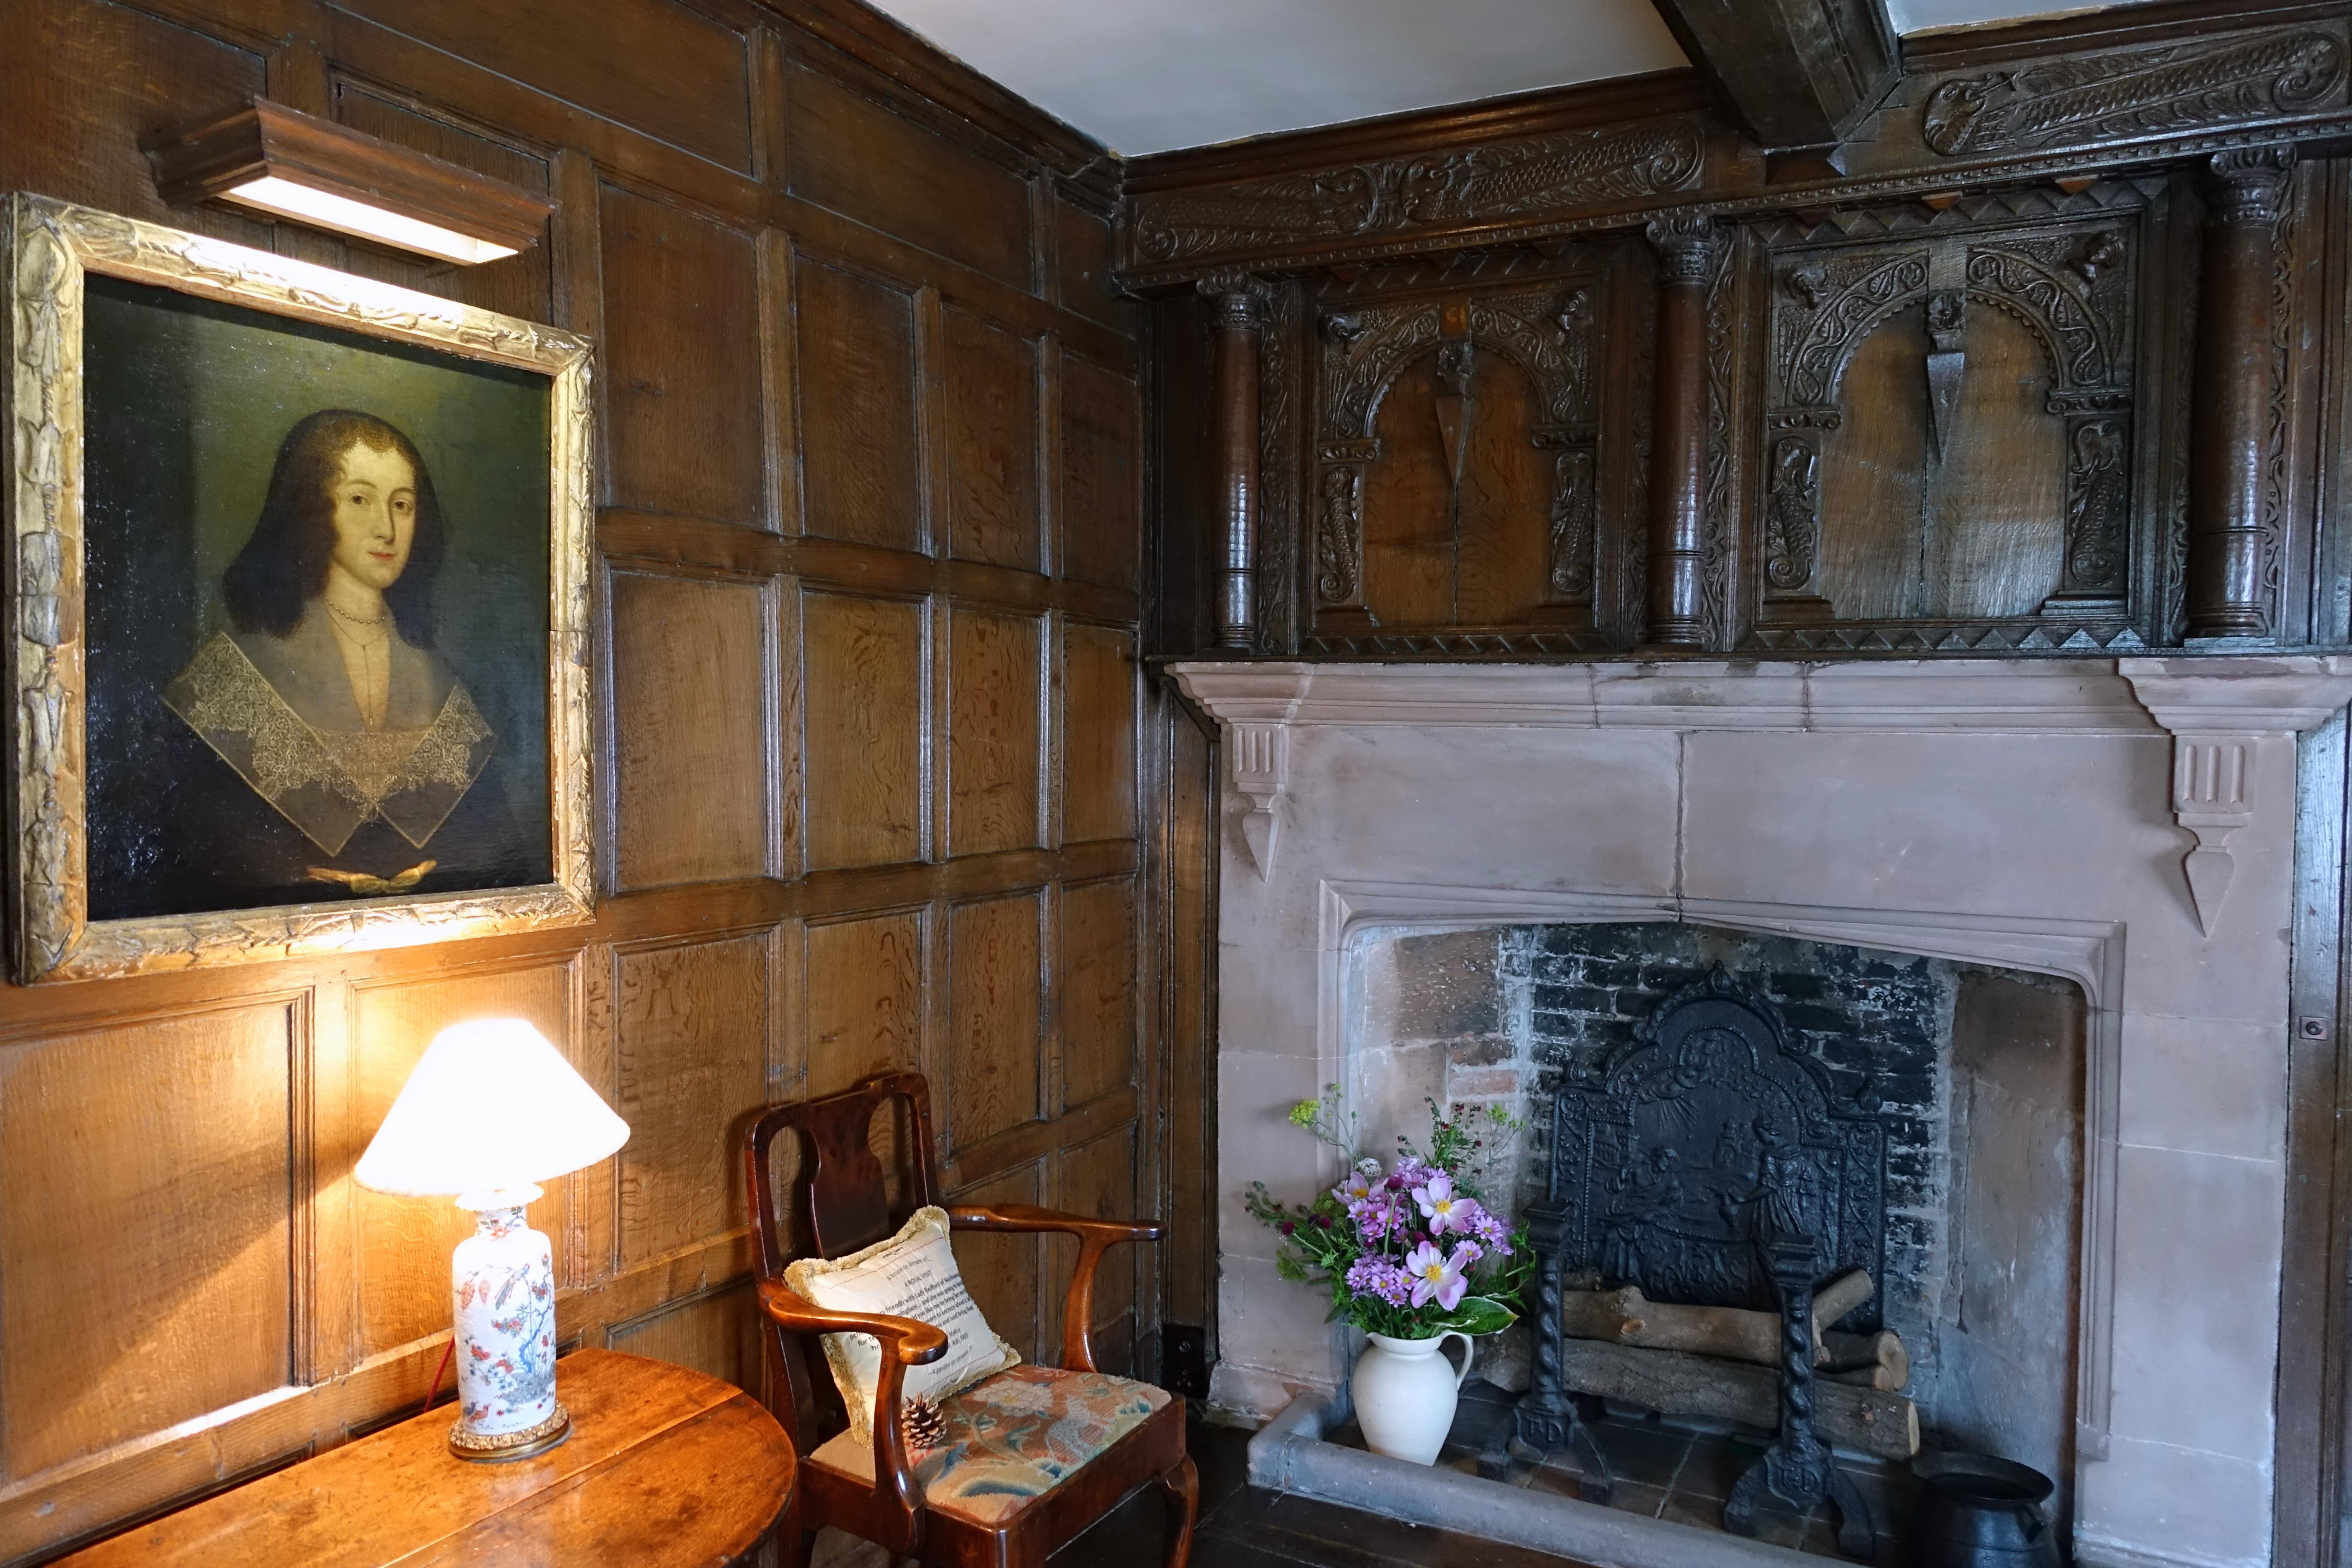 File:Drawing Room - Packwood House - Warwickshire, England ...